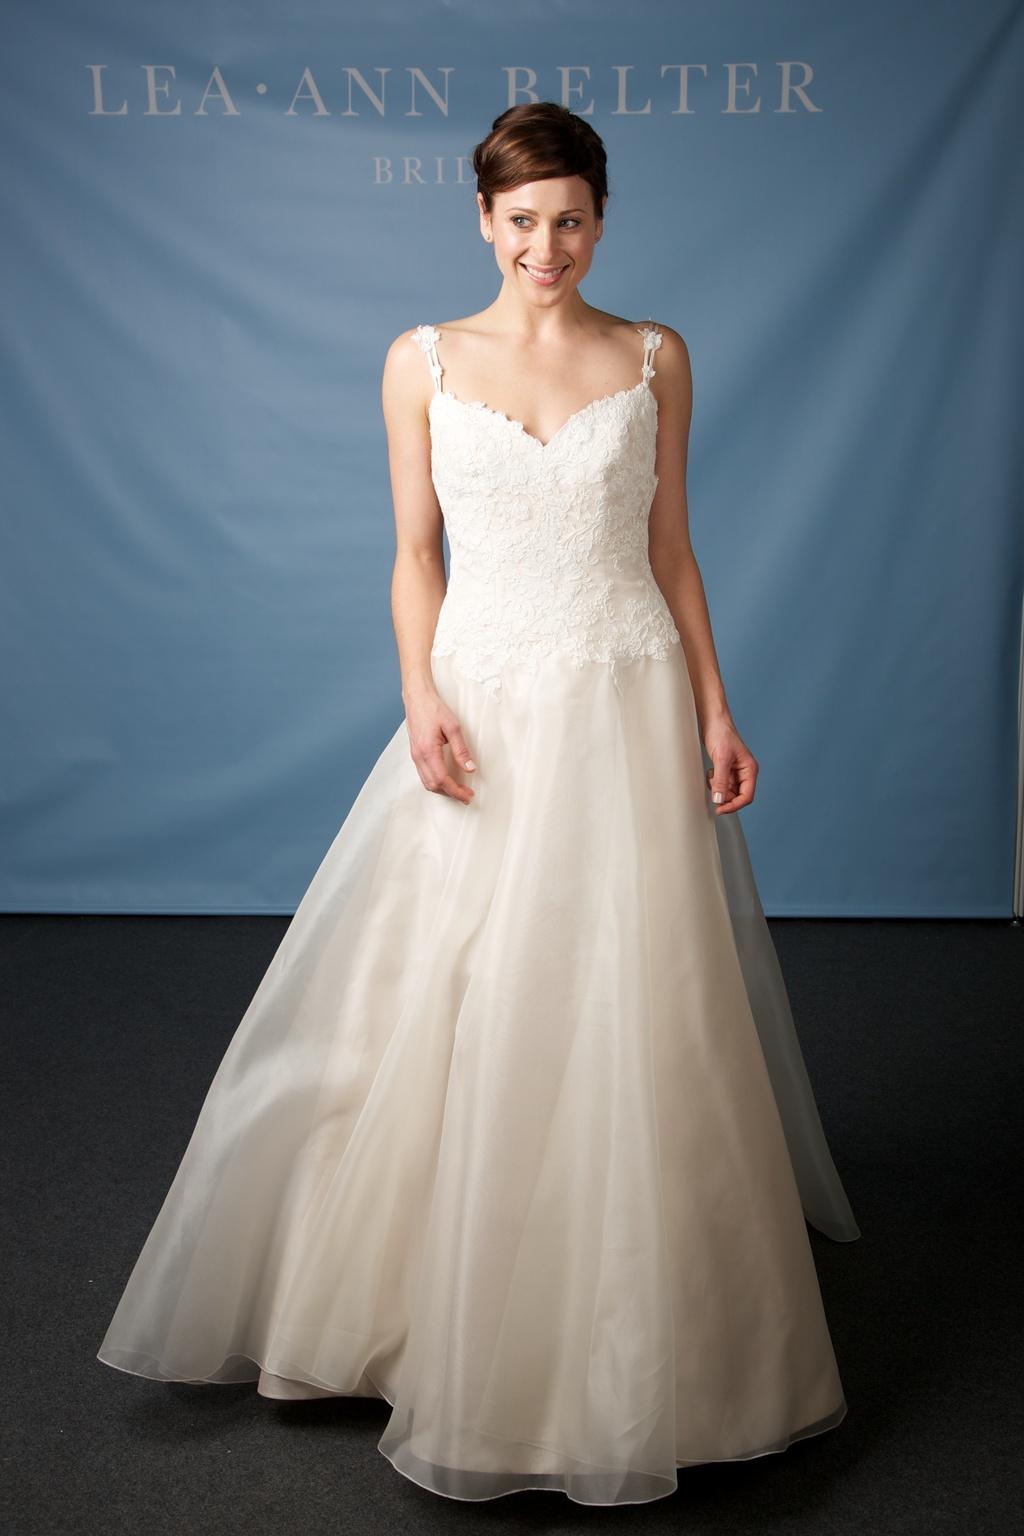 Lea-ann-belter-wedding-dress-2013-bridal-scarlette.full